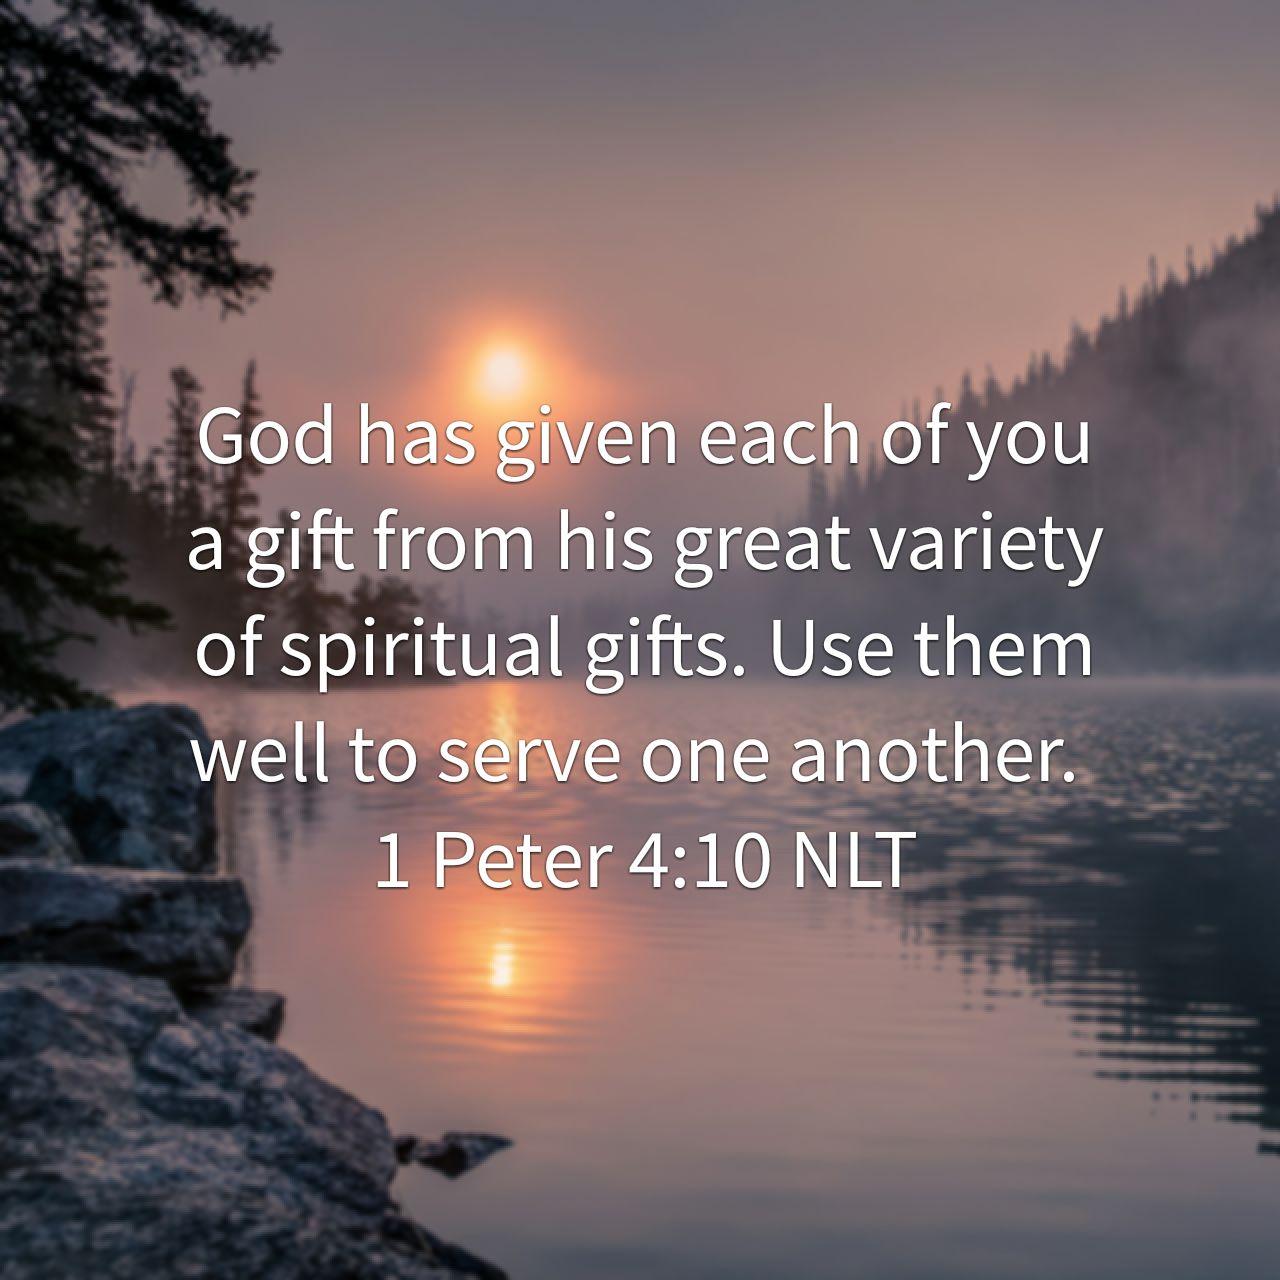 1 Peter 4:10 NLT